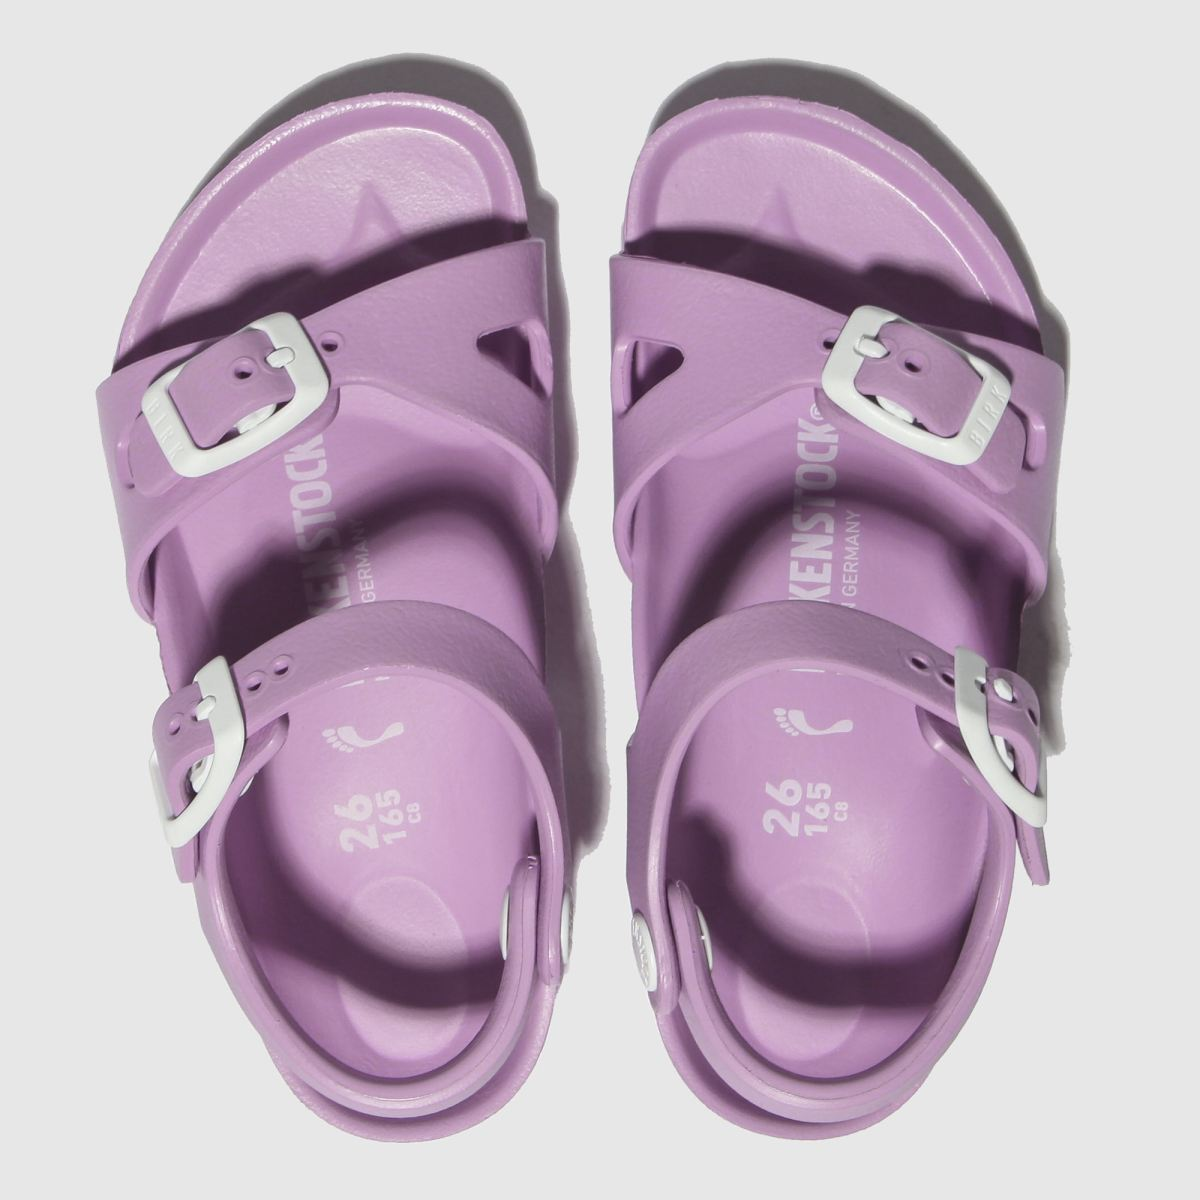 Birkenstock Lilac Rio Eva Sandals Toddler